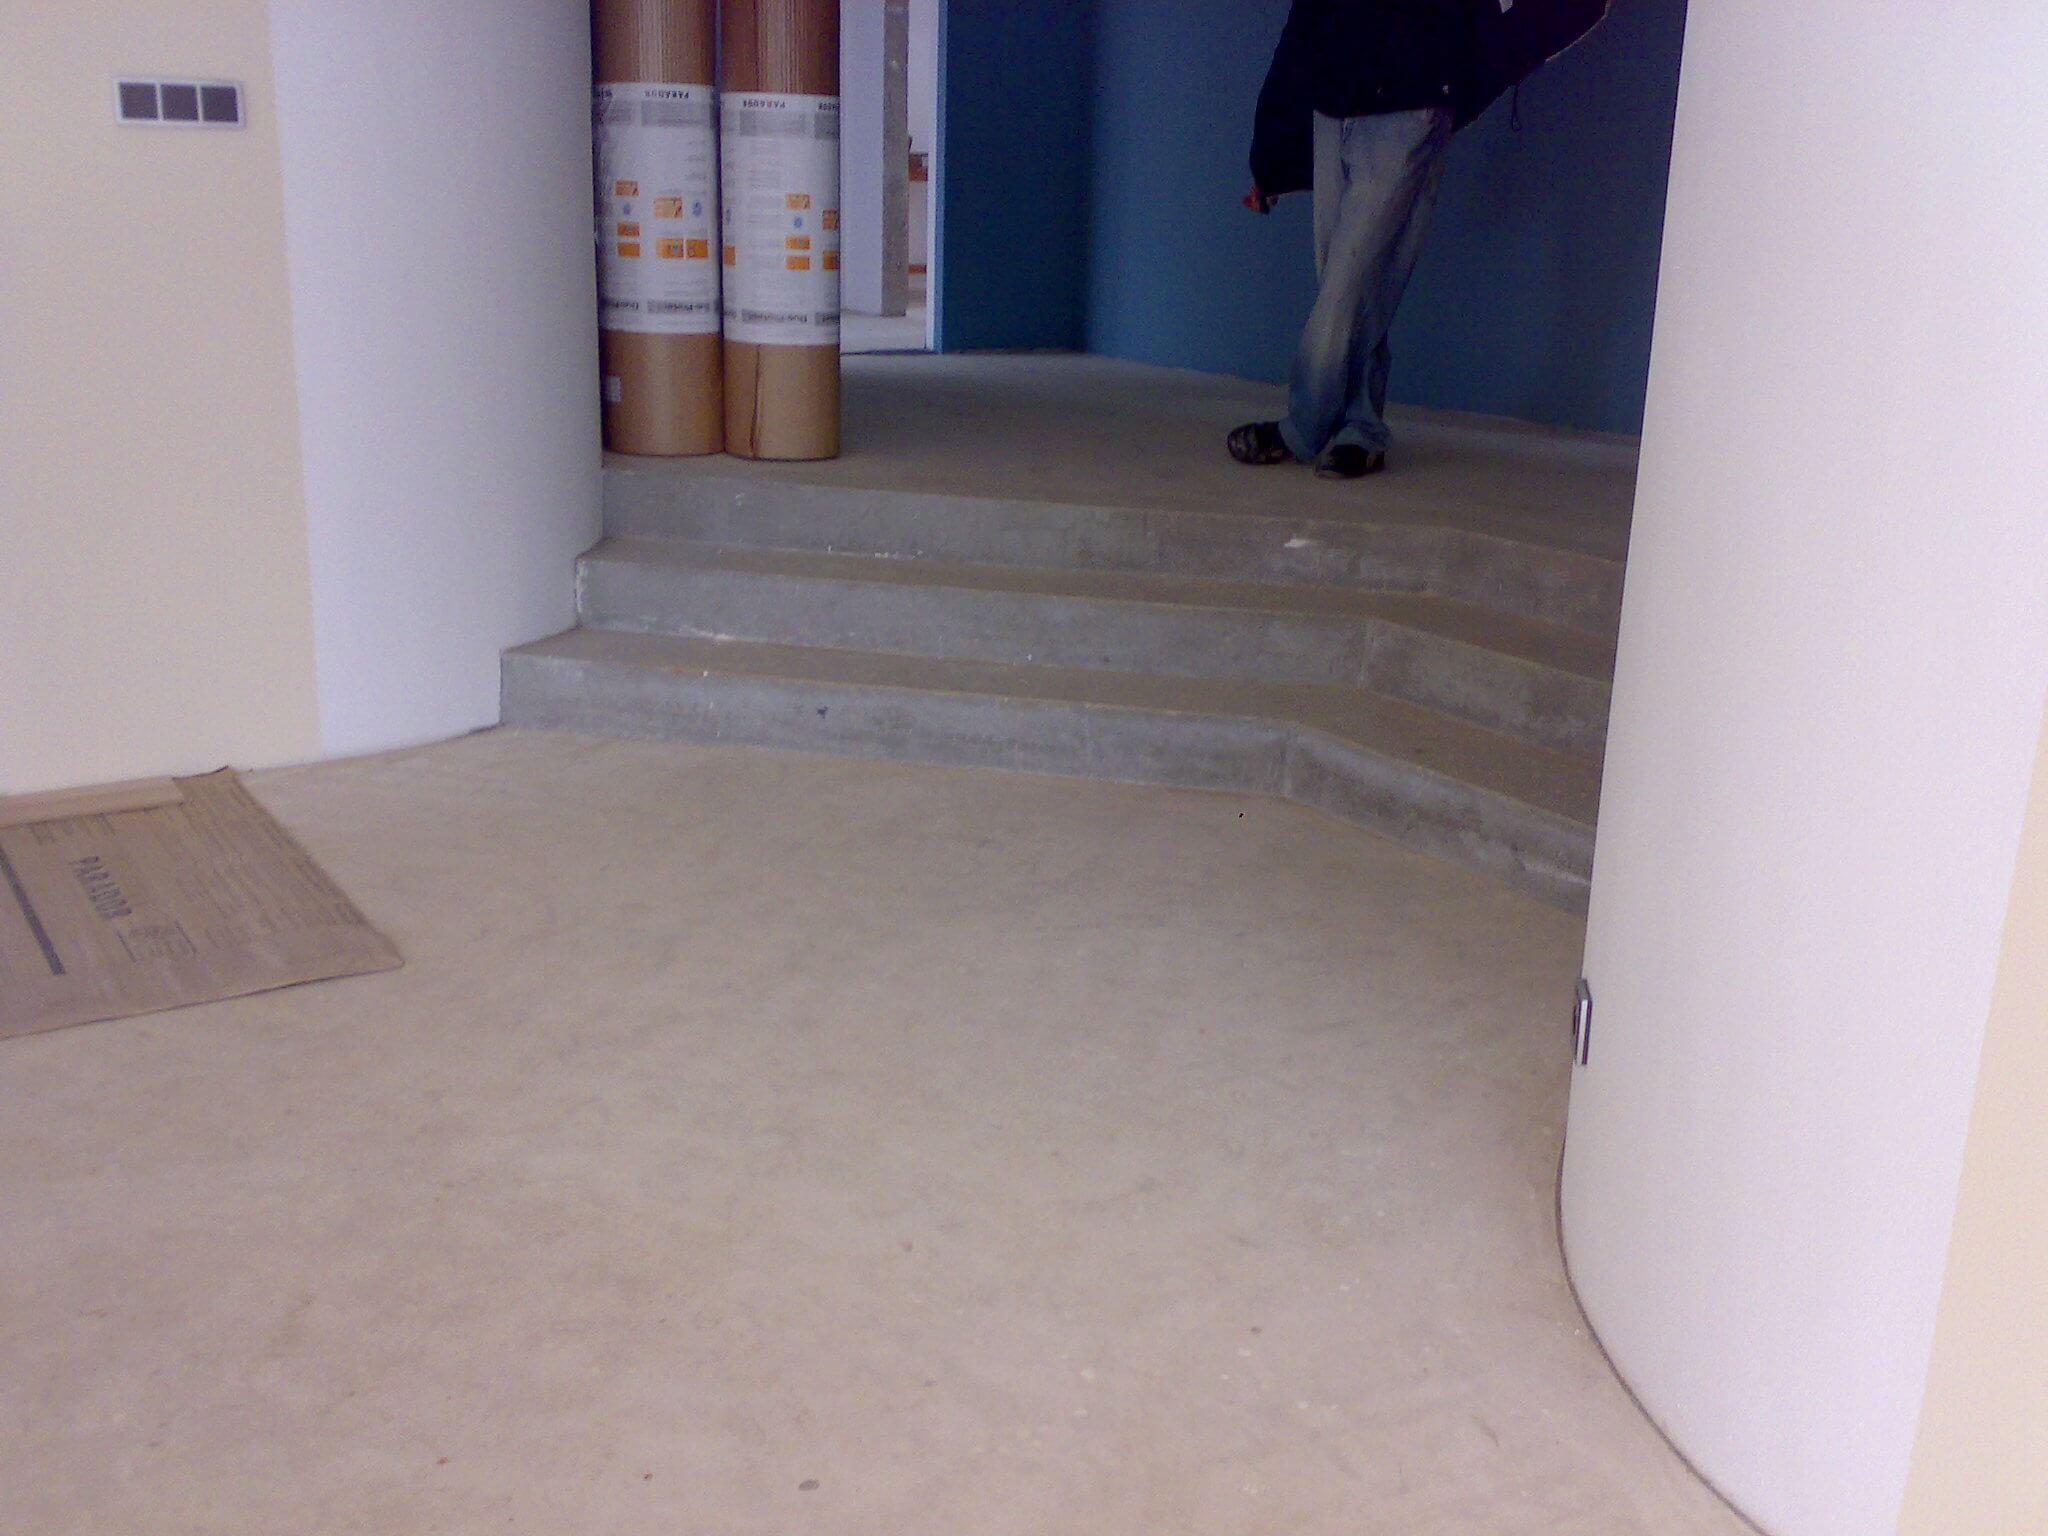 plovouci-podlaha-podlaharstvi-vojtech-bohac (2)